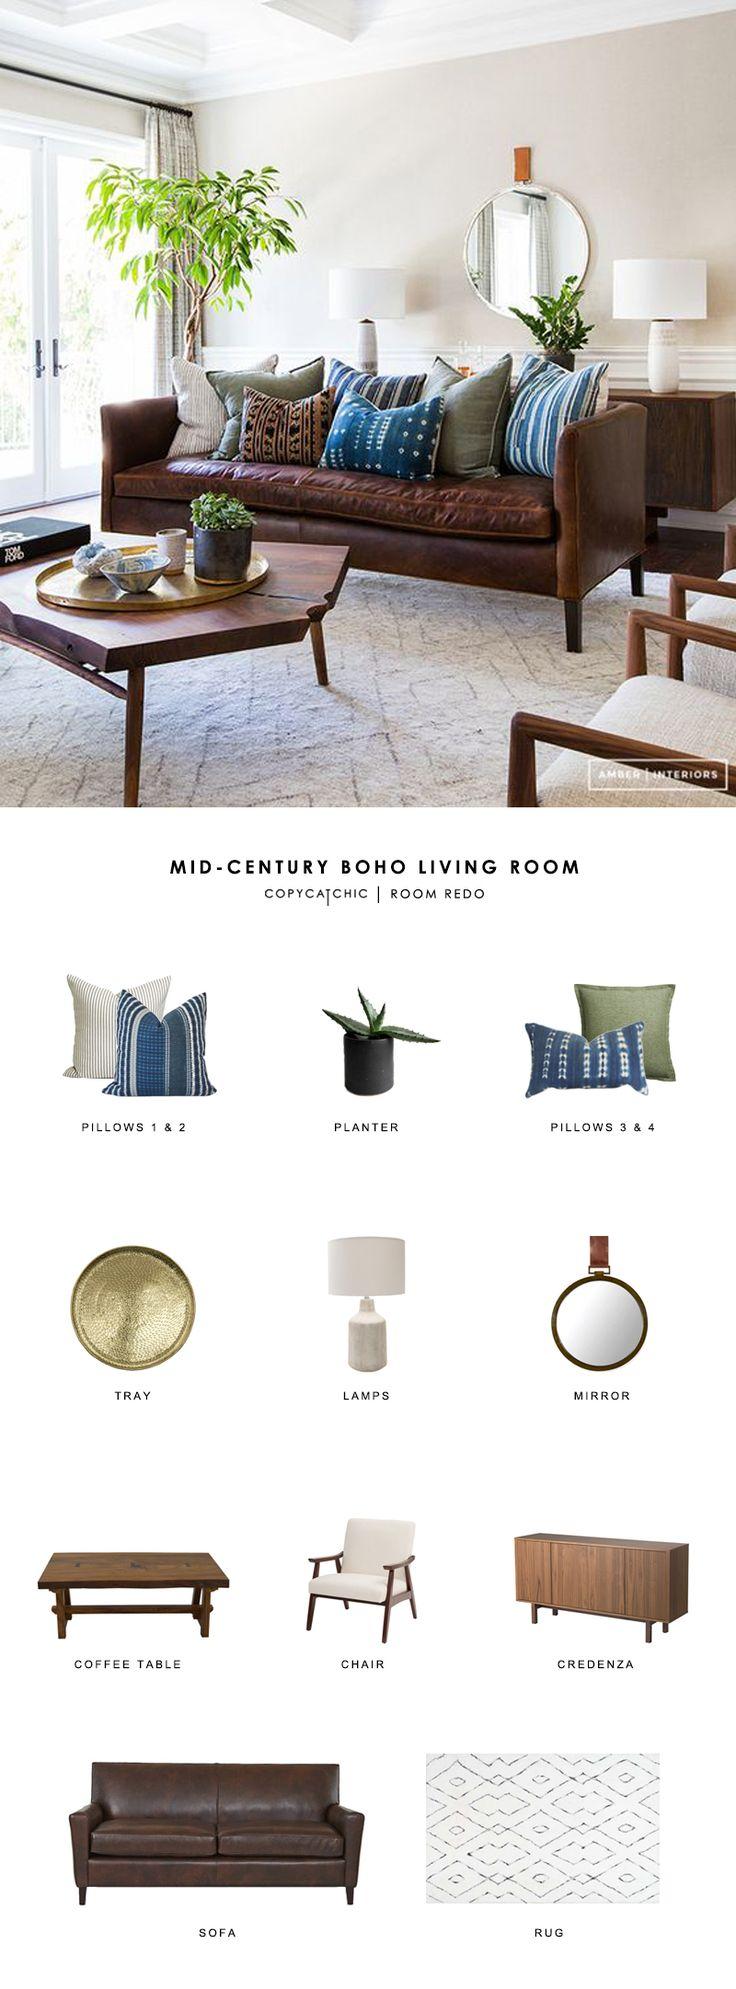 Copy Cat Chic Room Redo | Mid Century Boho Living Room | Copy Cat Chic | Bloglovin'